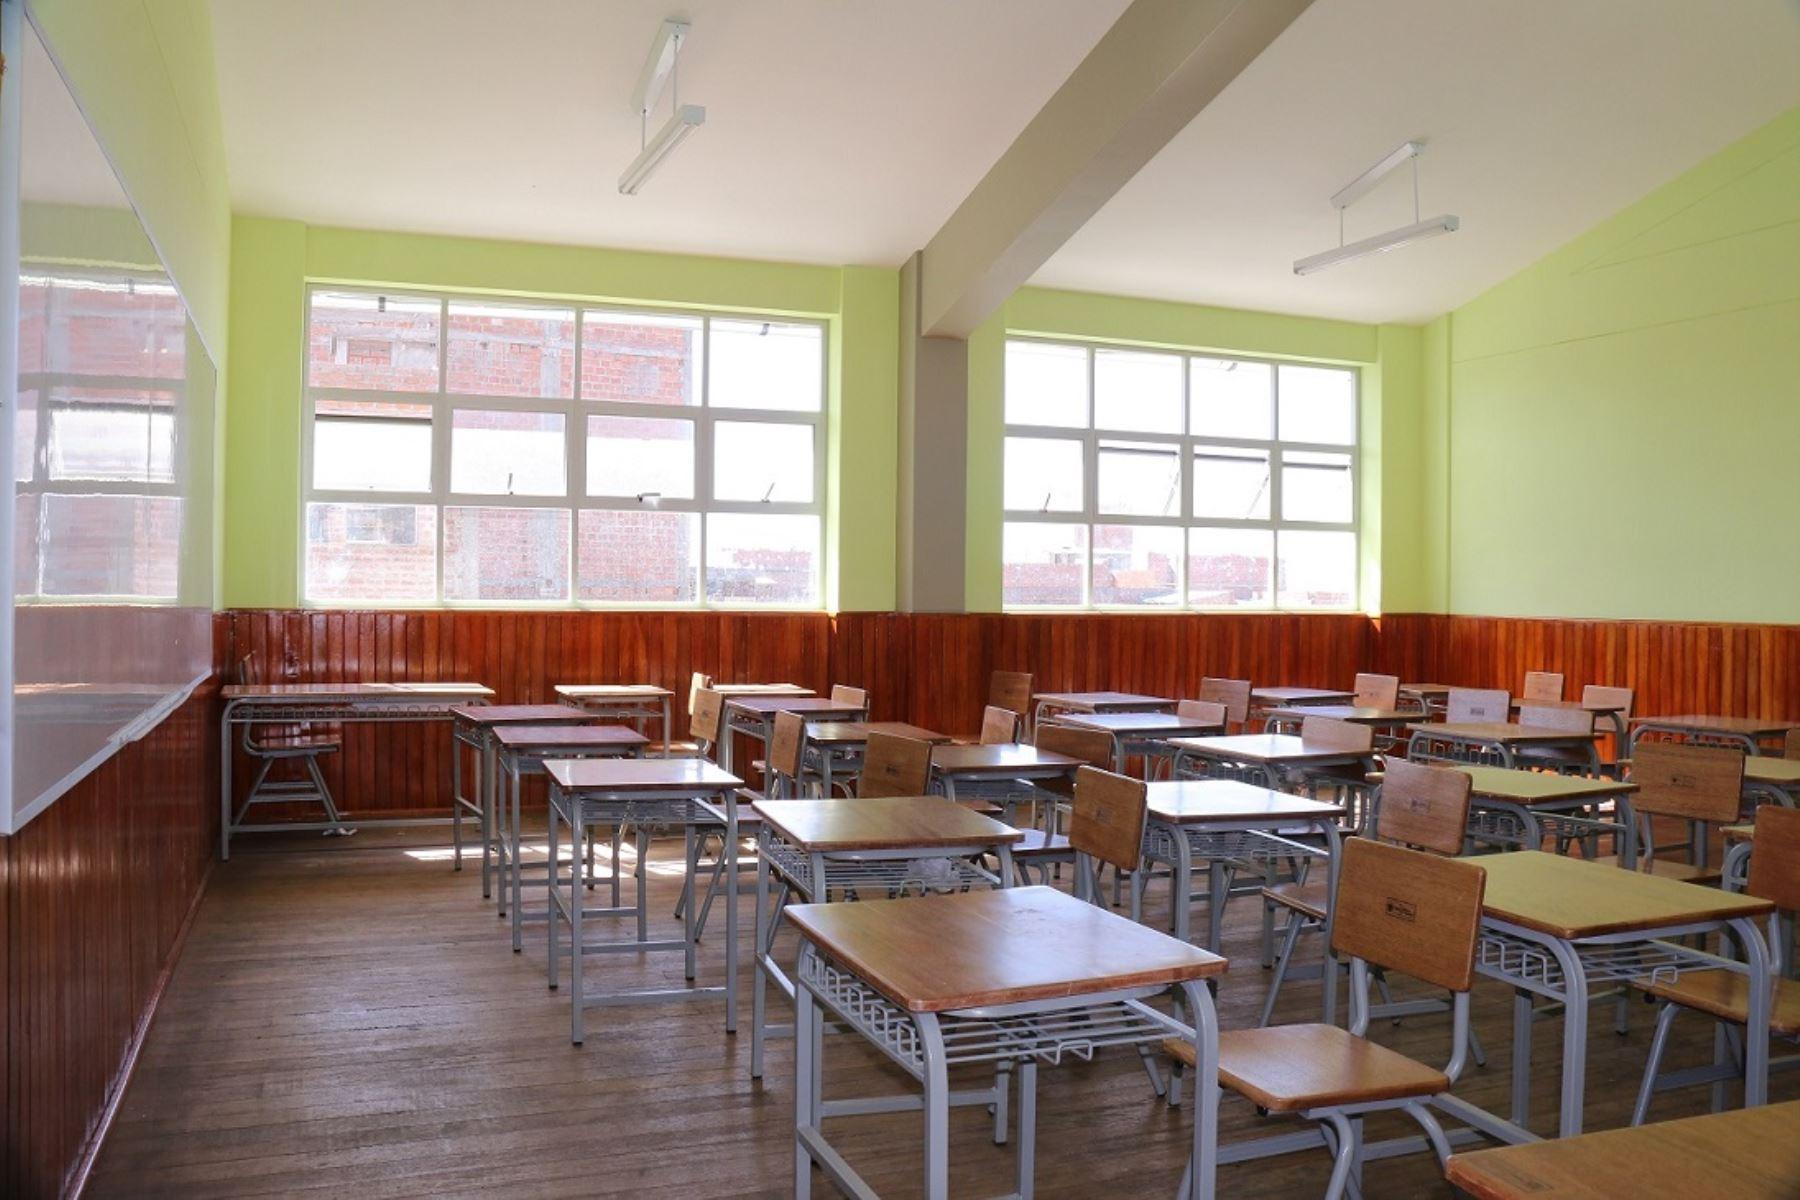 invierten s 27 mllns para adquirir mobiliario para On mobiliario para colegios